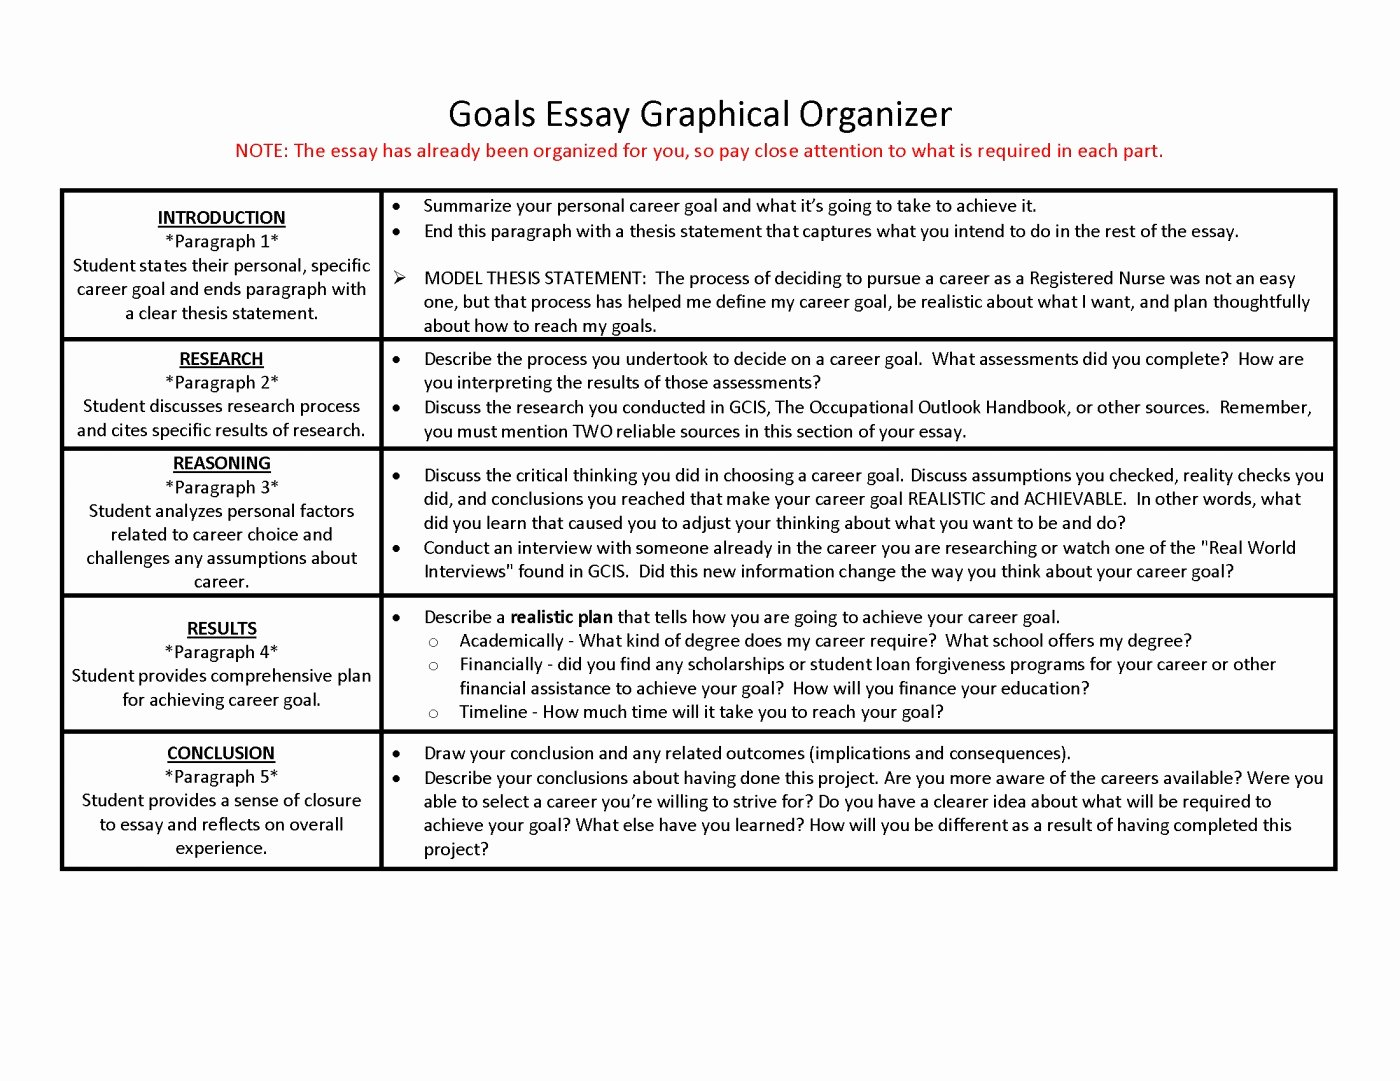 023 career goal statement zdxttkpg educational and goals essay